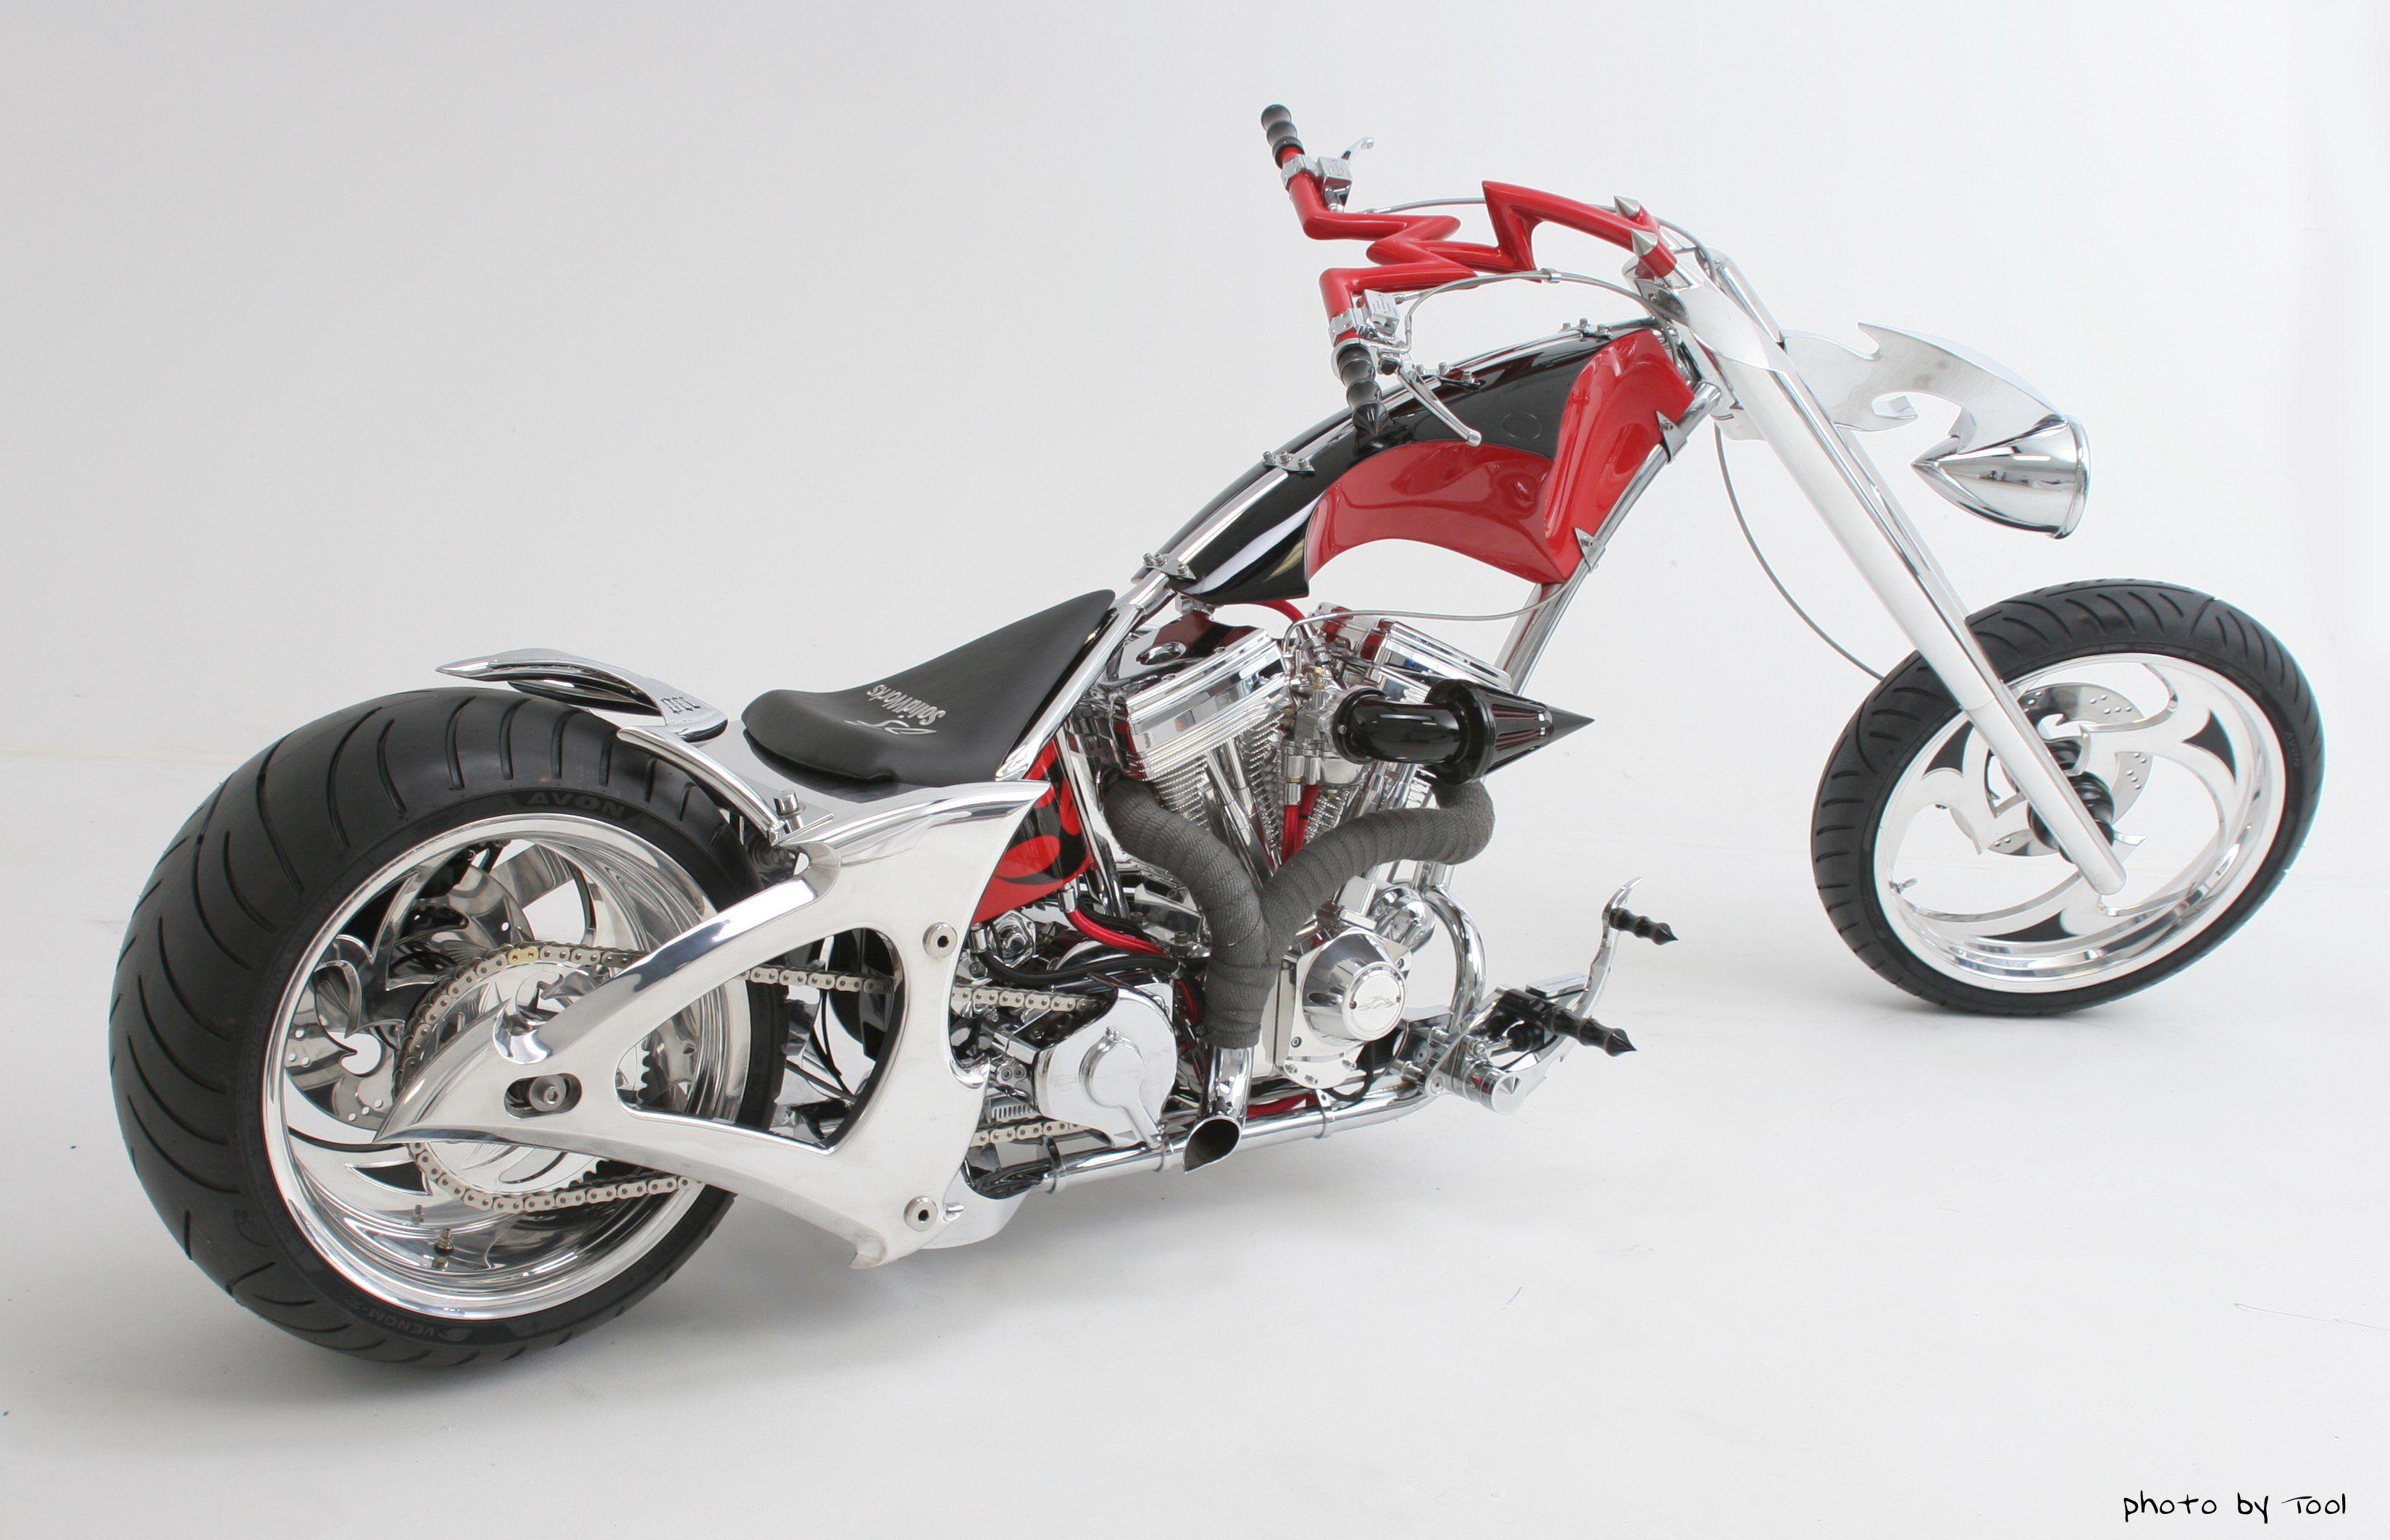 orange county choppers occ custom chopper hot rod rods bike motorbike motorcycle american. Black Bedroom Furniture Sets. Home Design Ideas